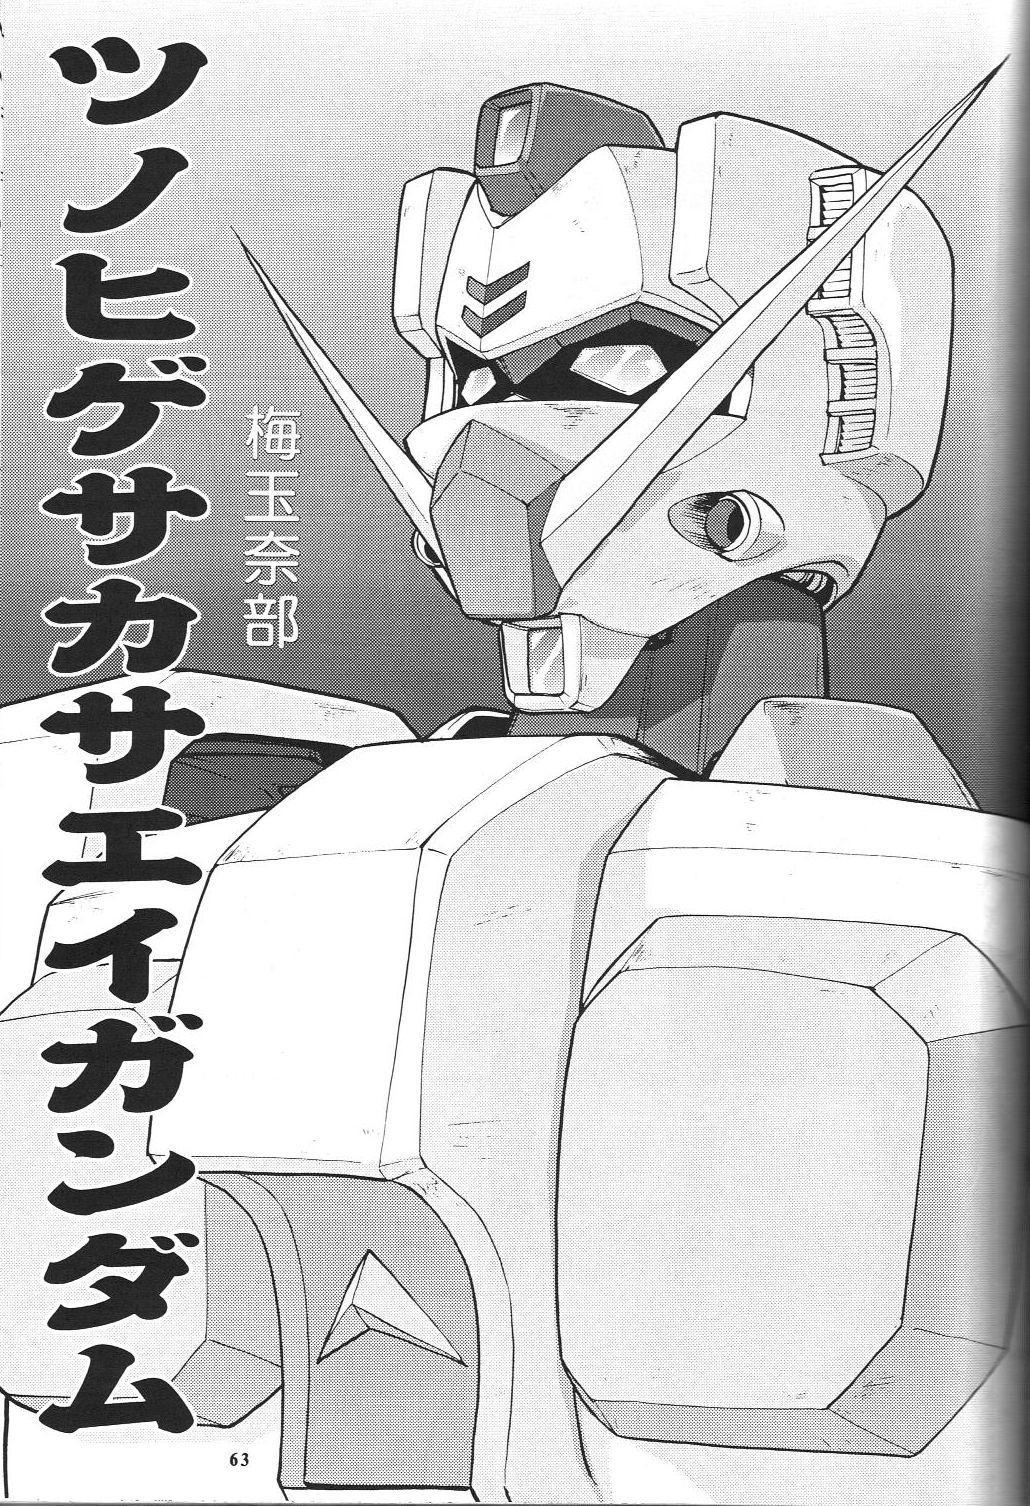 (C56) [Tsurikichi Doumei (Various)] Sengoku Rock - Nan Demo-R (Various) 63